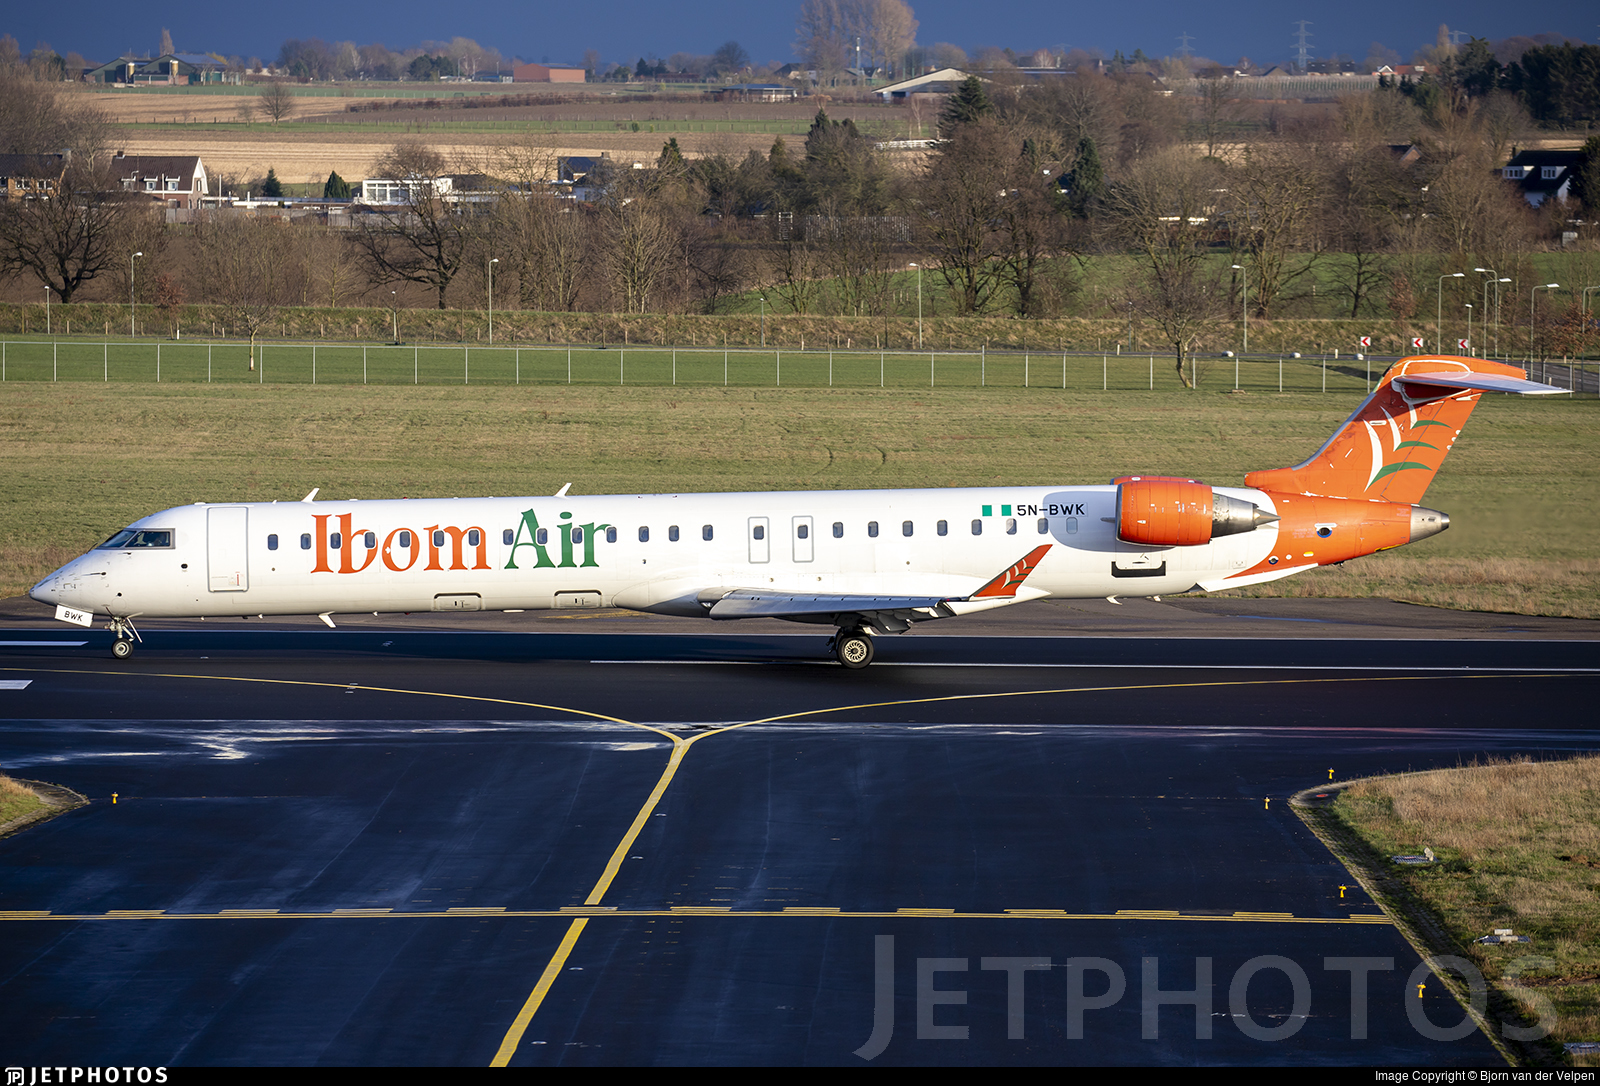 5N-BWK - Bombardier CRJ-900LR - Ibom Air